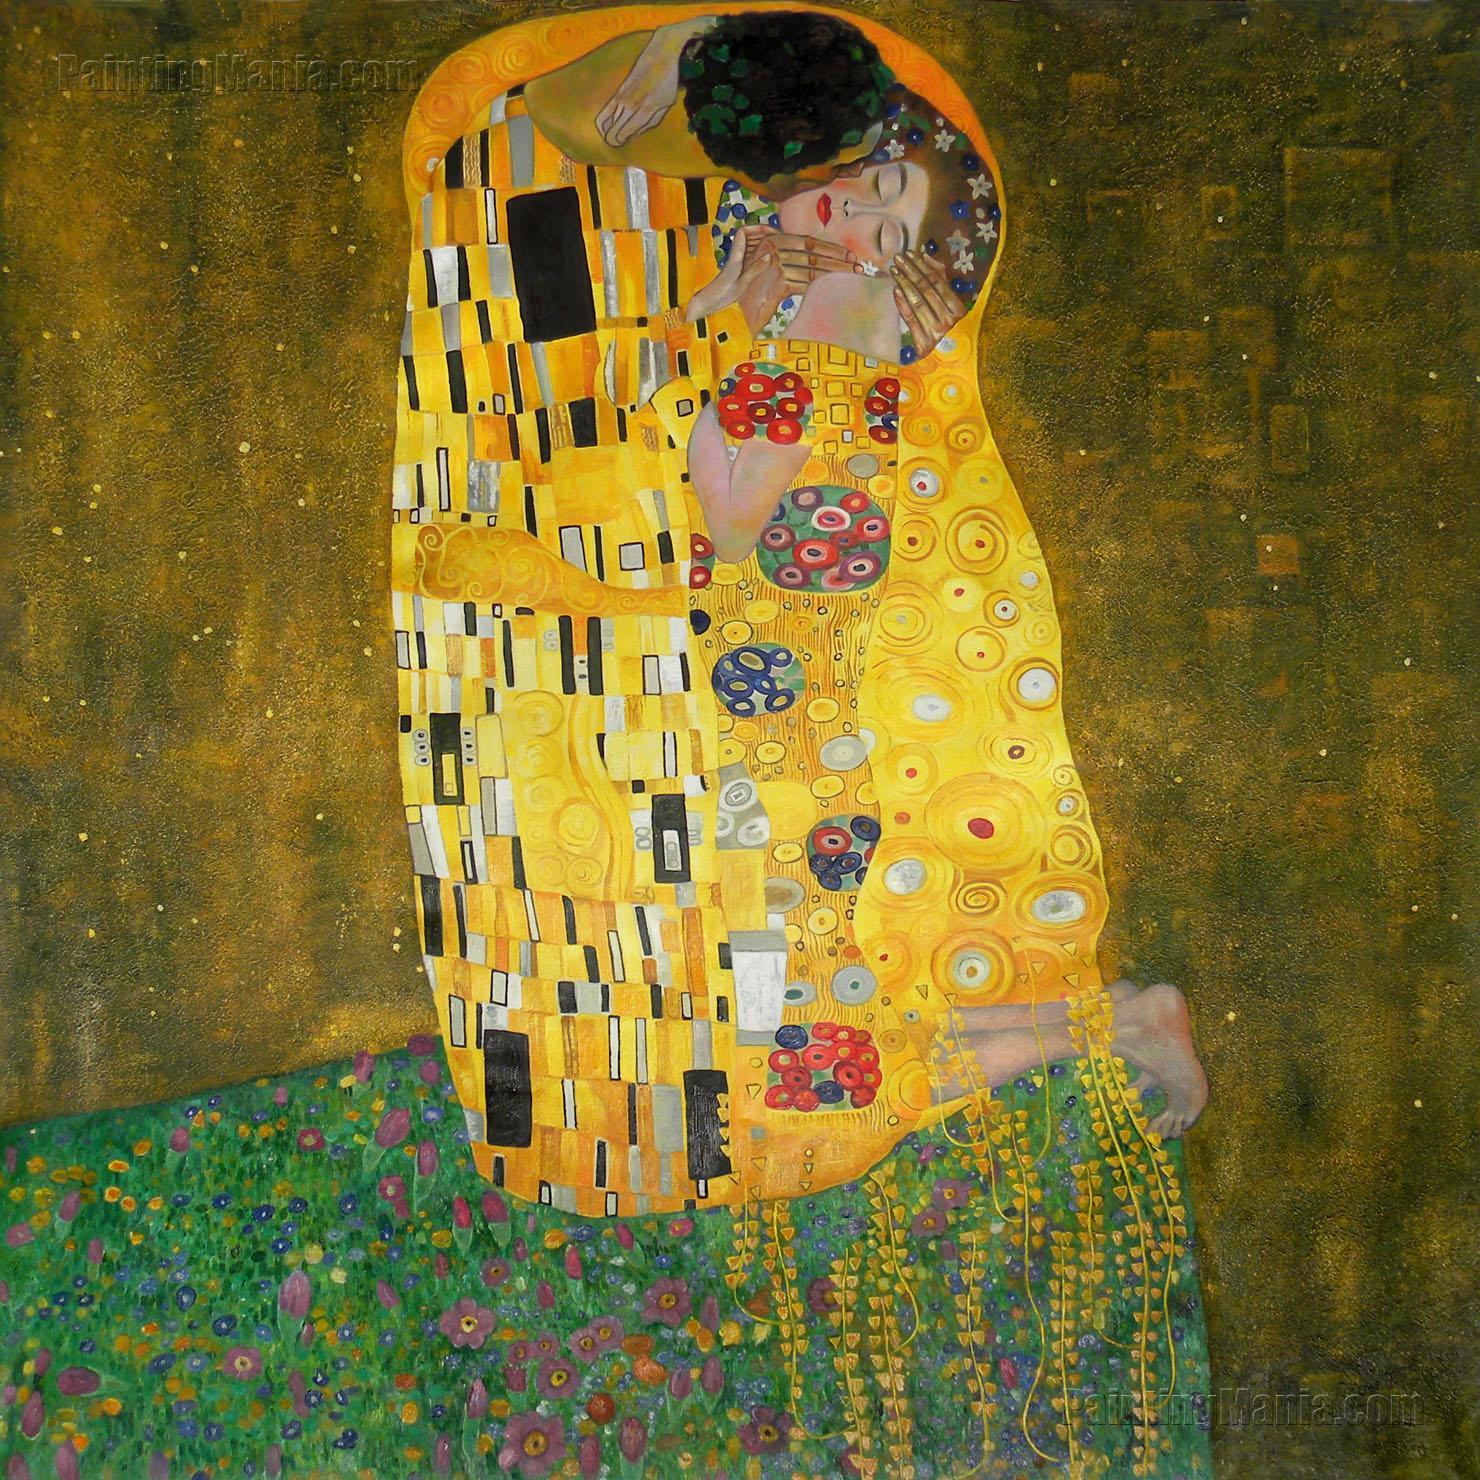 Klimt The Kiss Wallpaper The Kiss Klimt Wallpap...